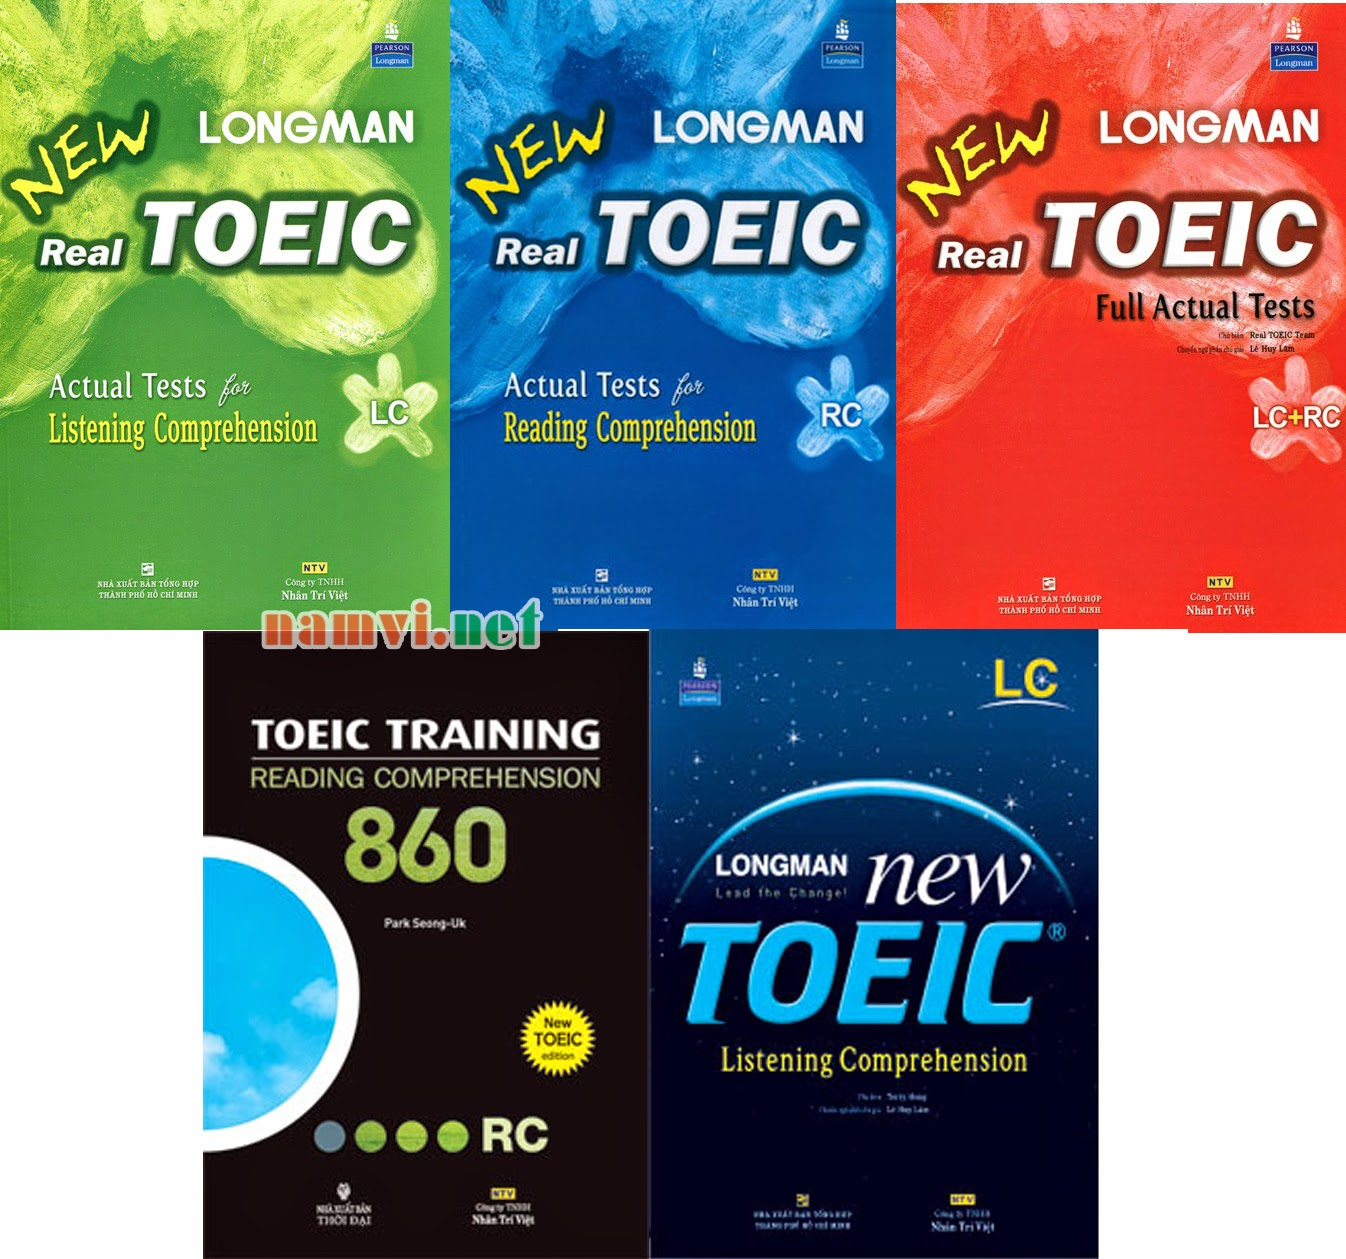 giáo trình New Longman Real TOEIC Actual Tests